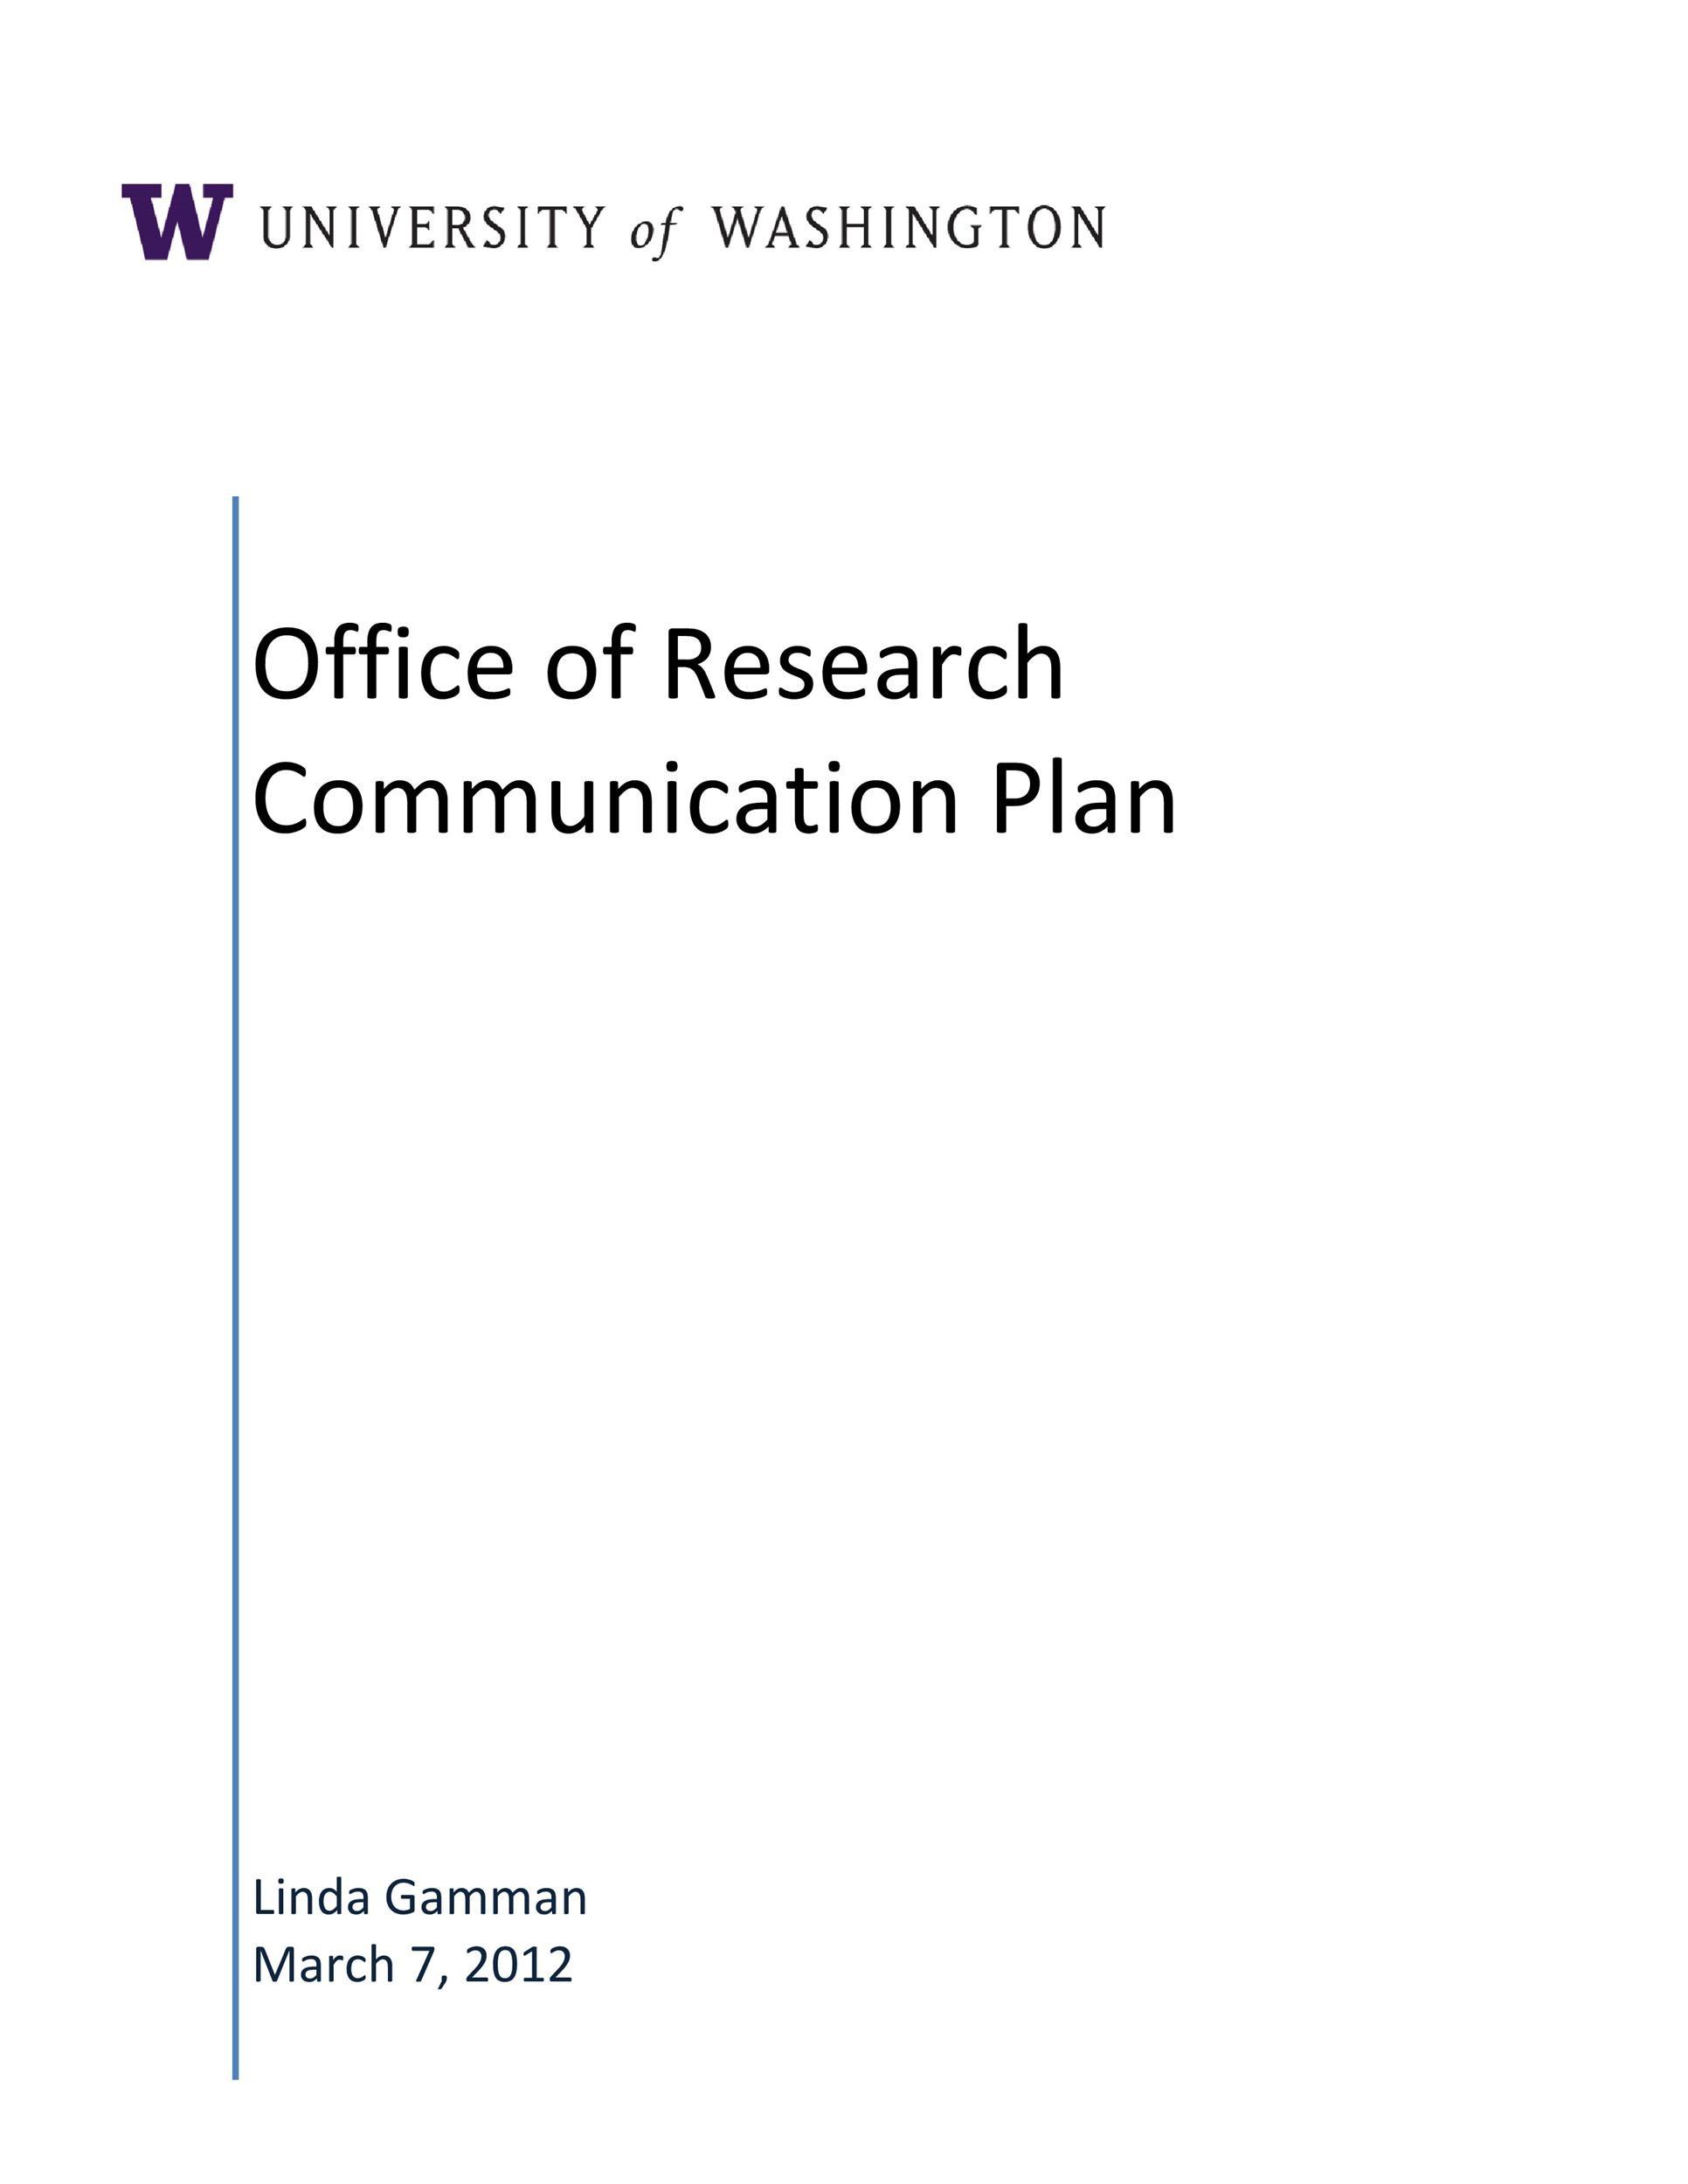 Free Communication Plan Template 34